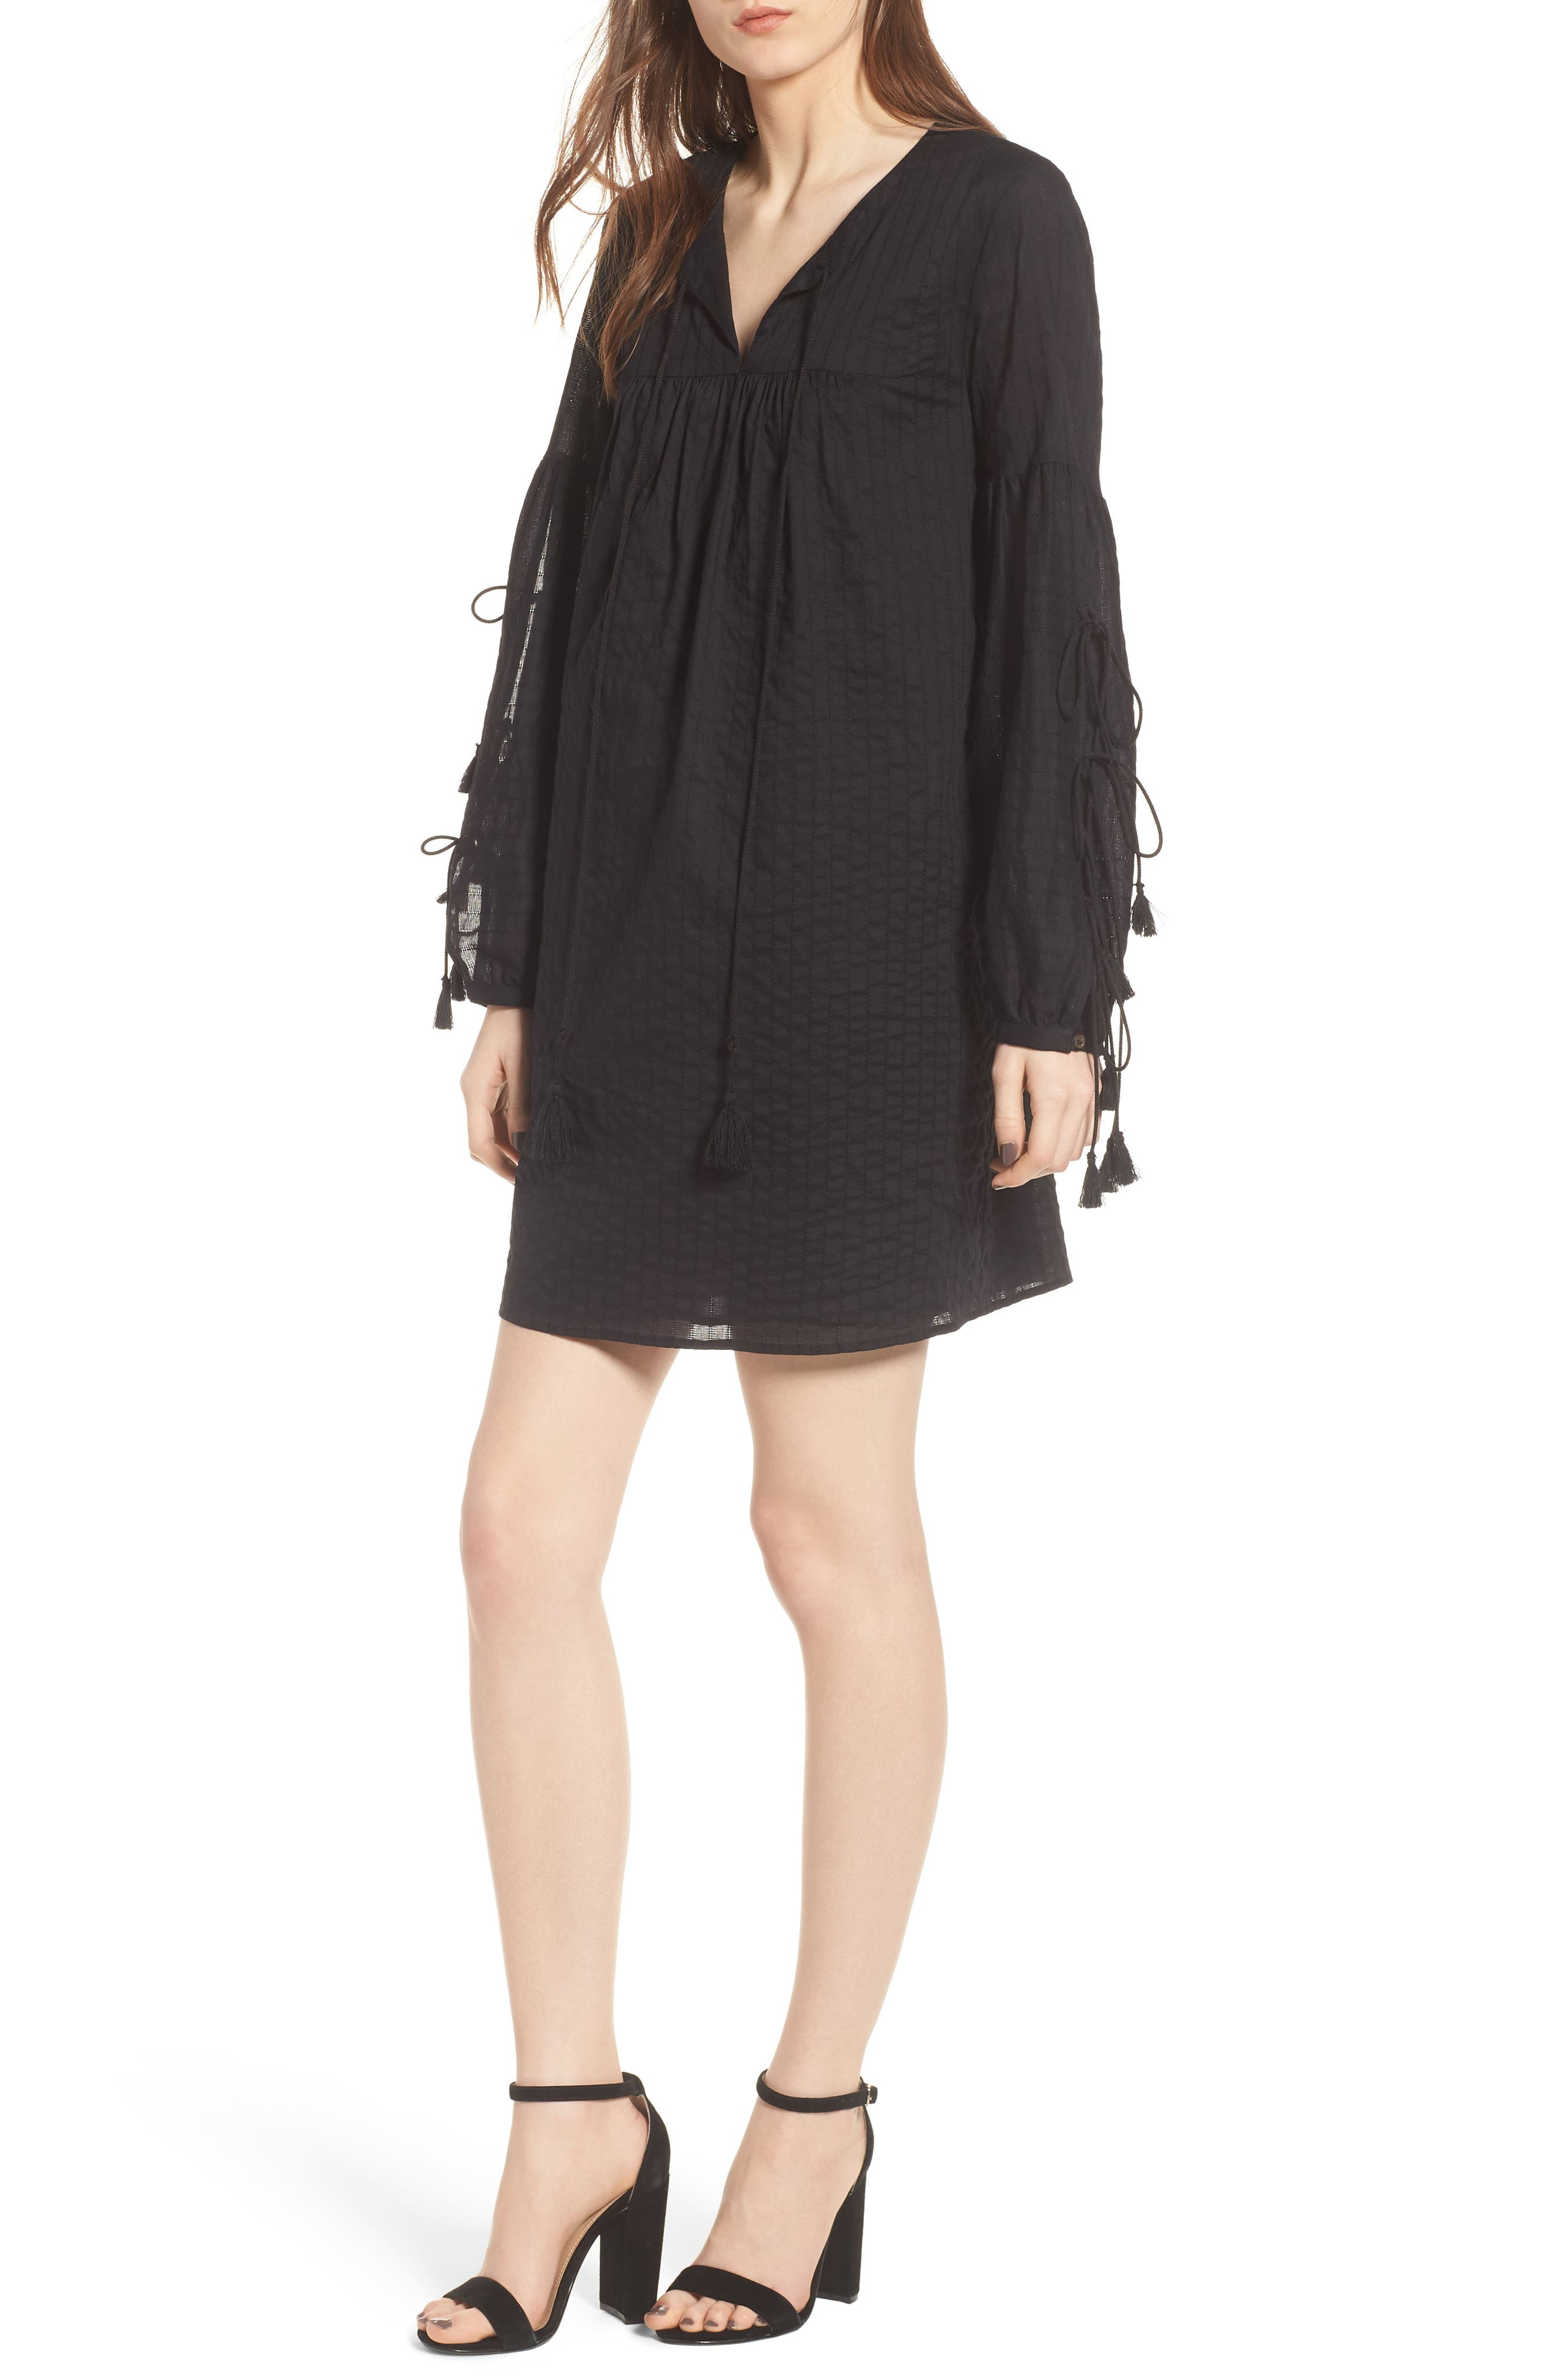 Main Image - Rebecca Minkoff Dolly Dress